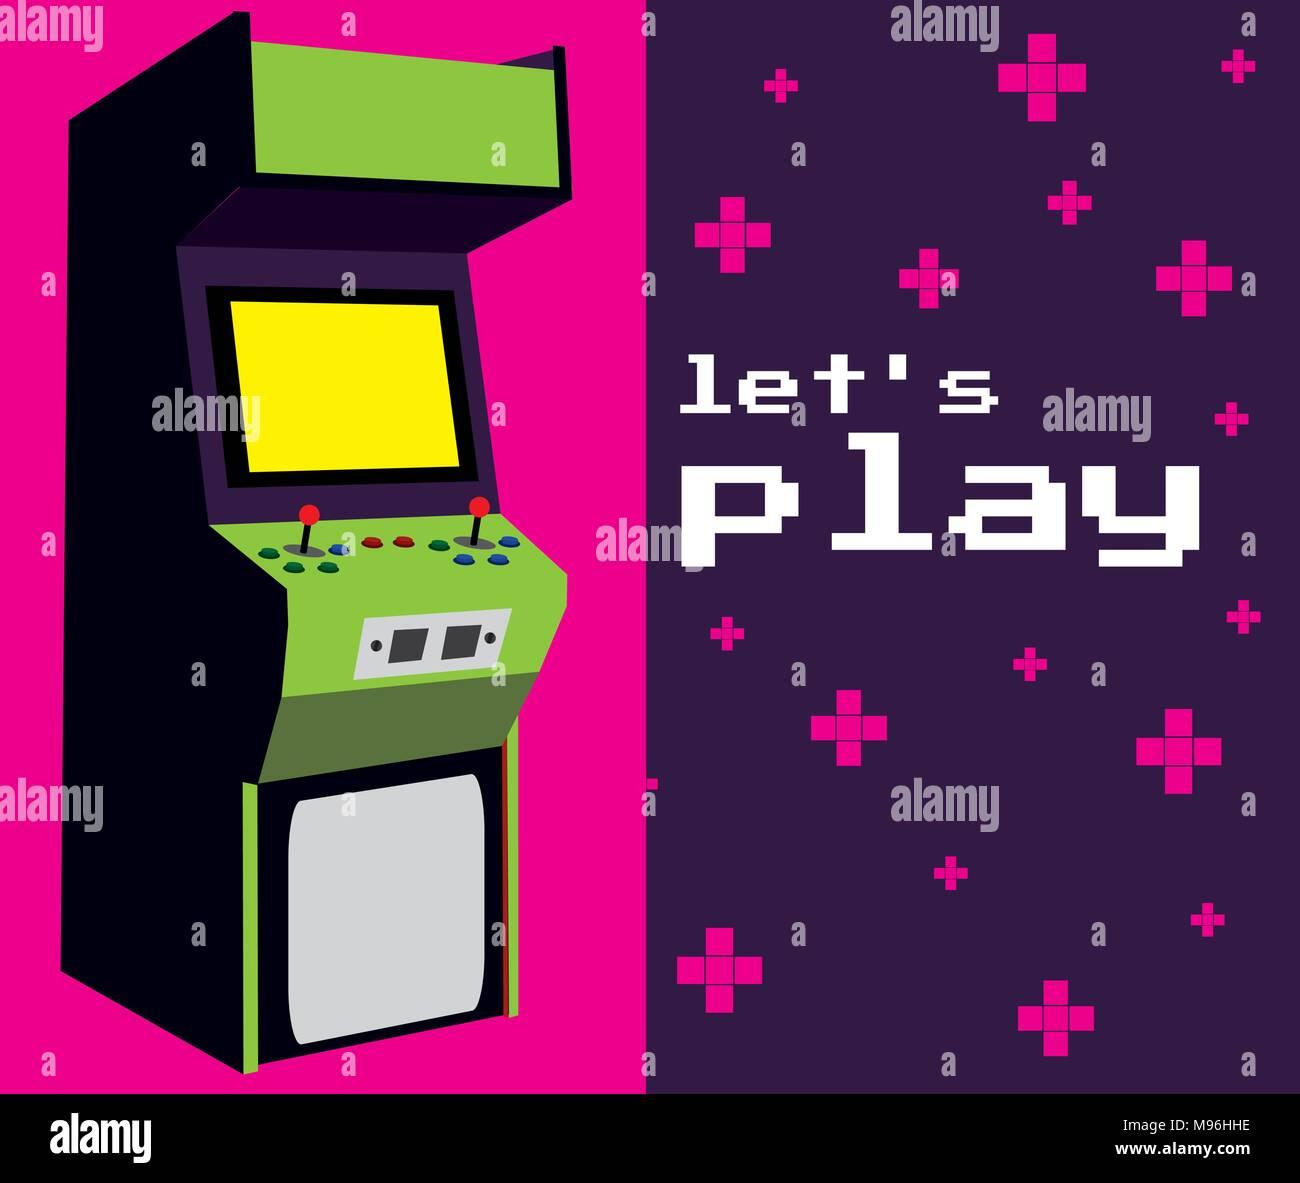 Lets play arcade - Stock Vector